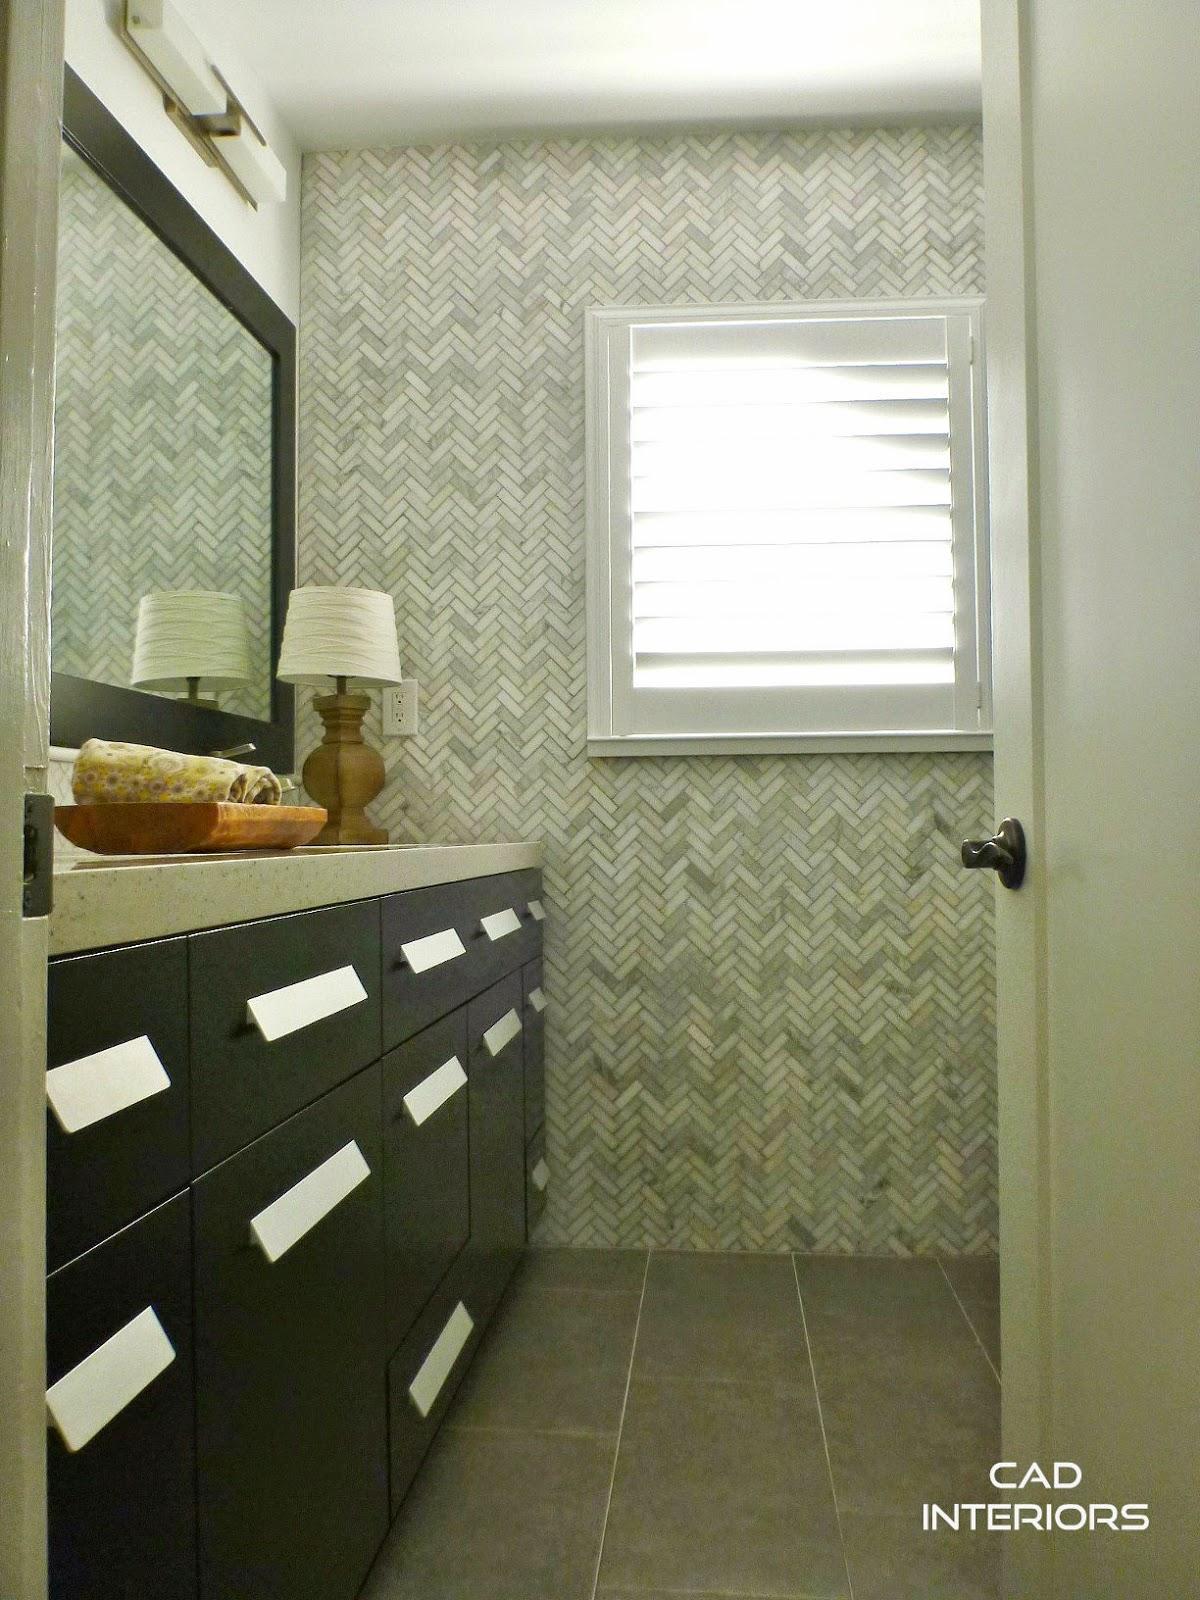 specialist affordable home interior design atlanta designers lanced best img balance in presstestimonials b